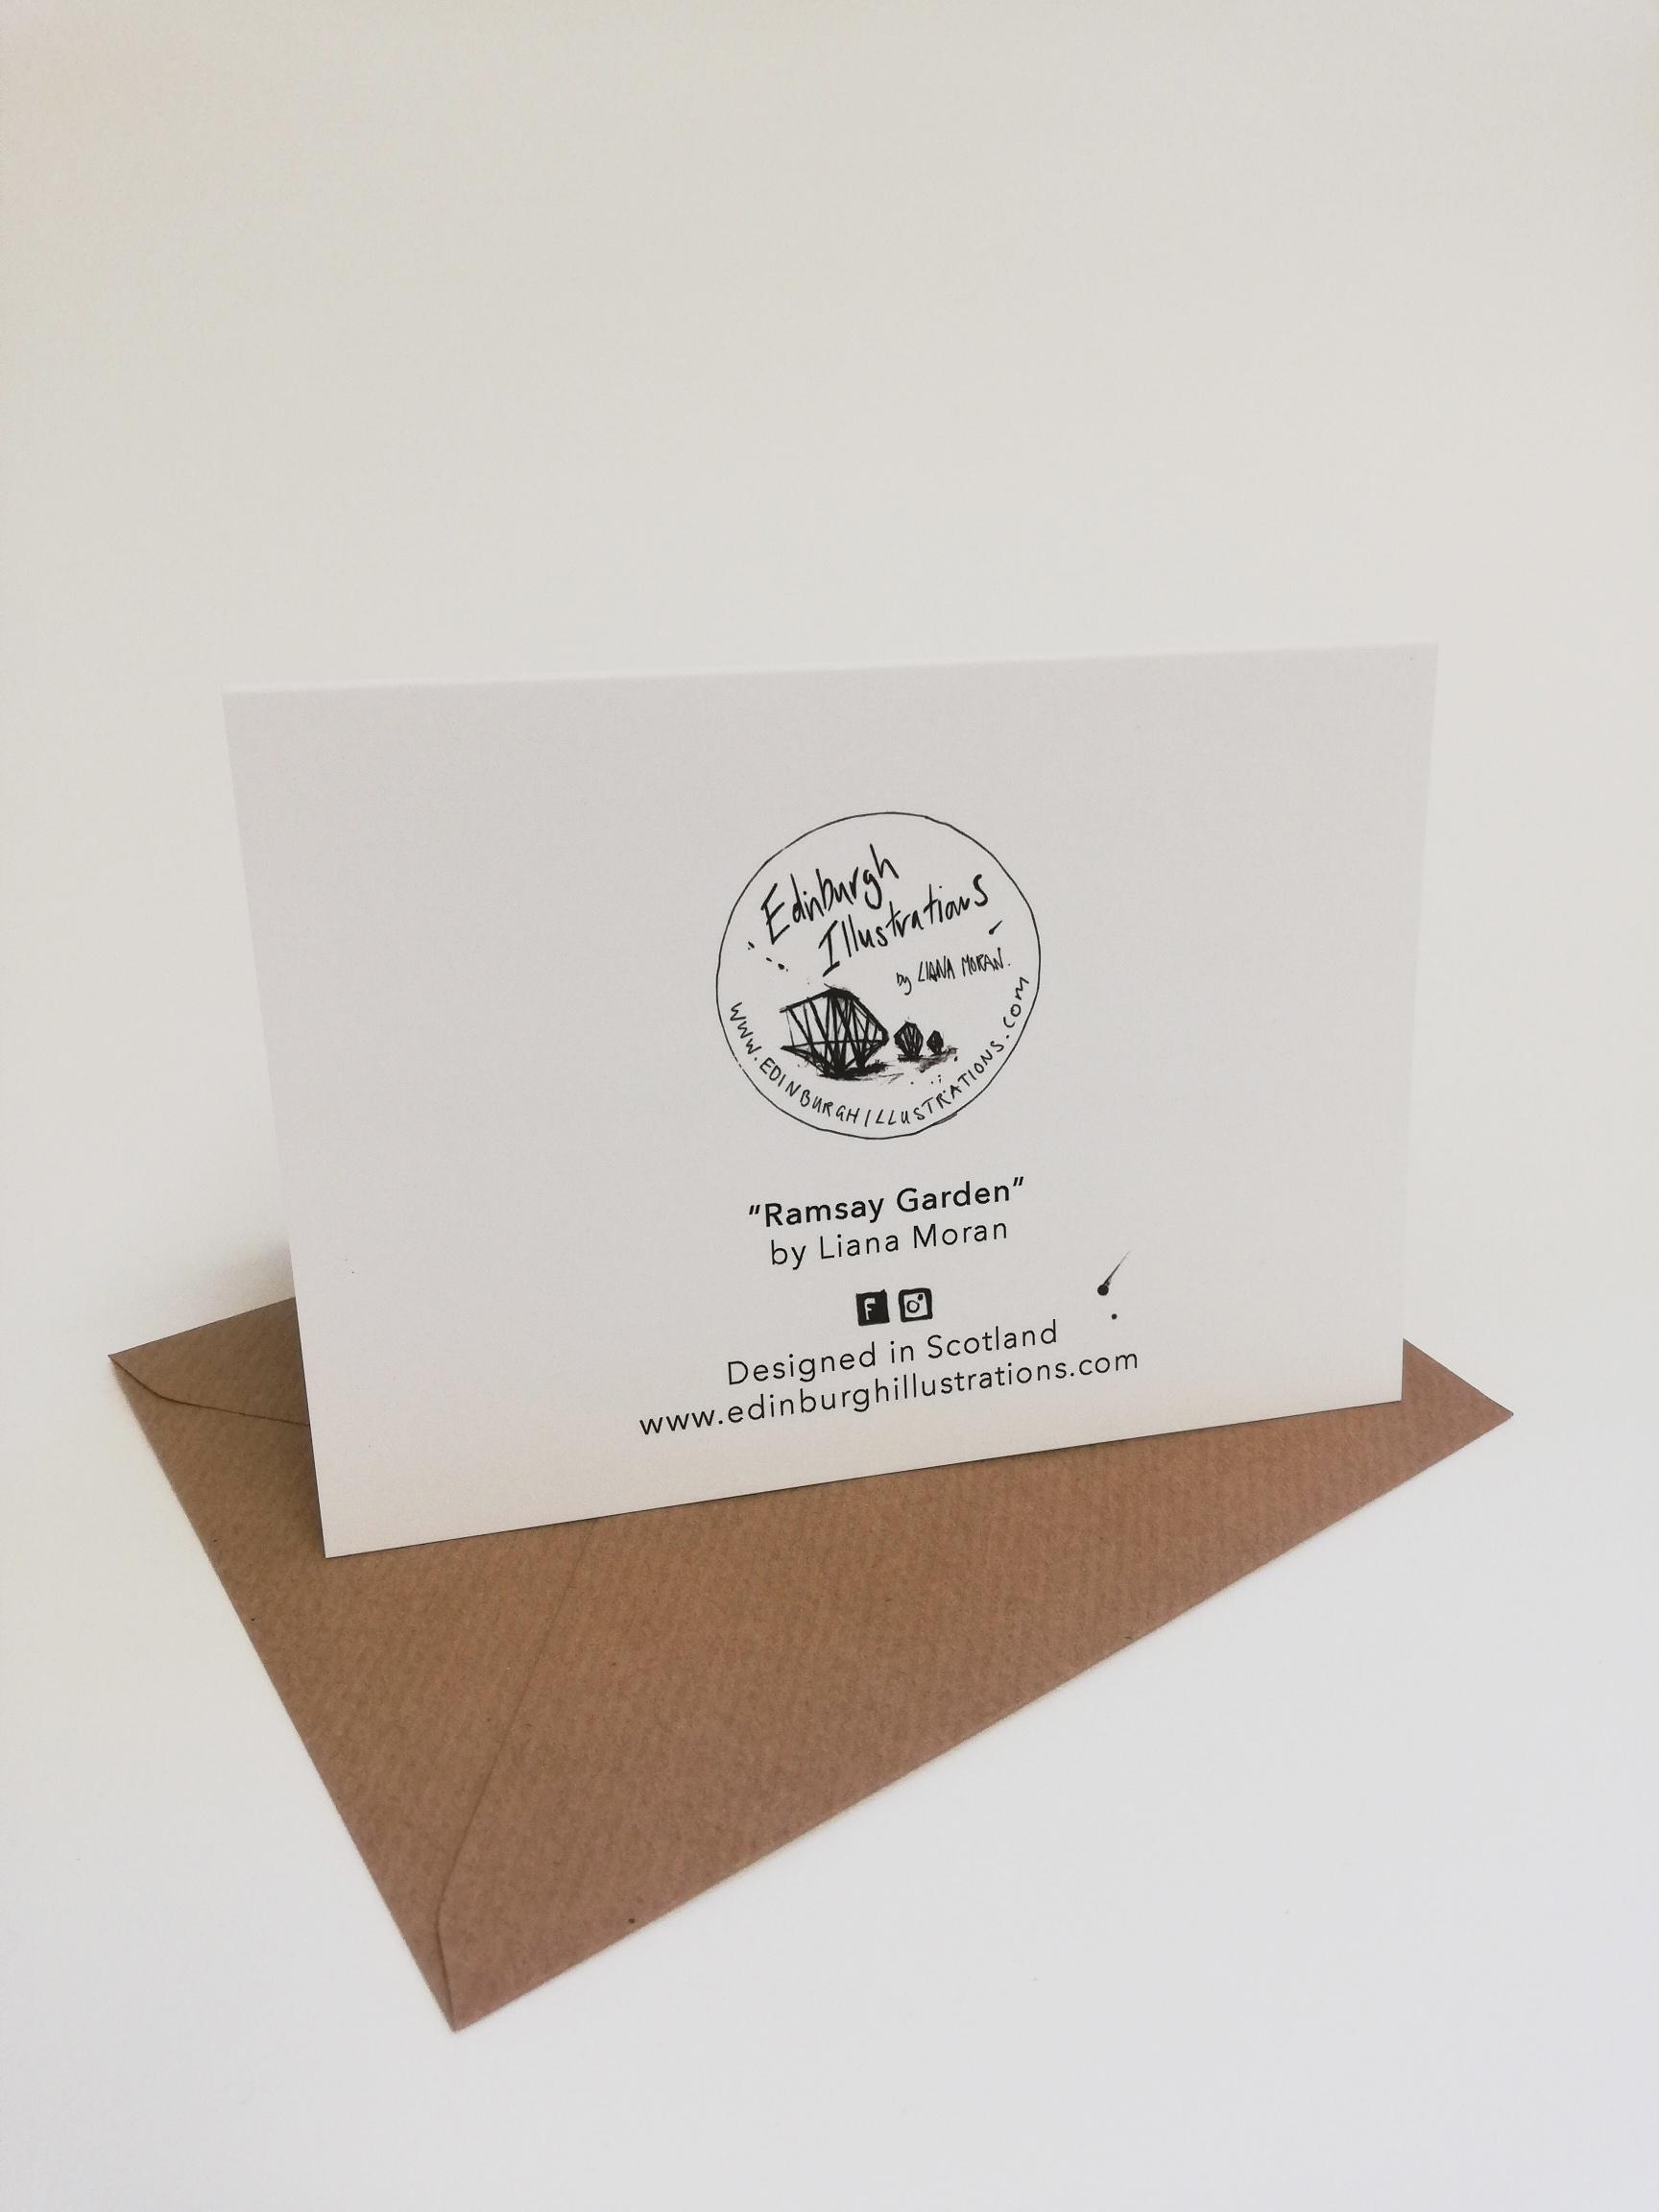 Ramsay Garden card